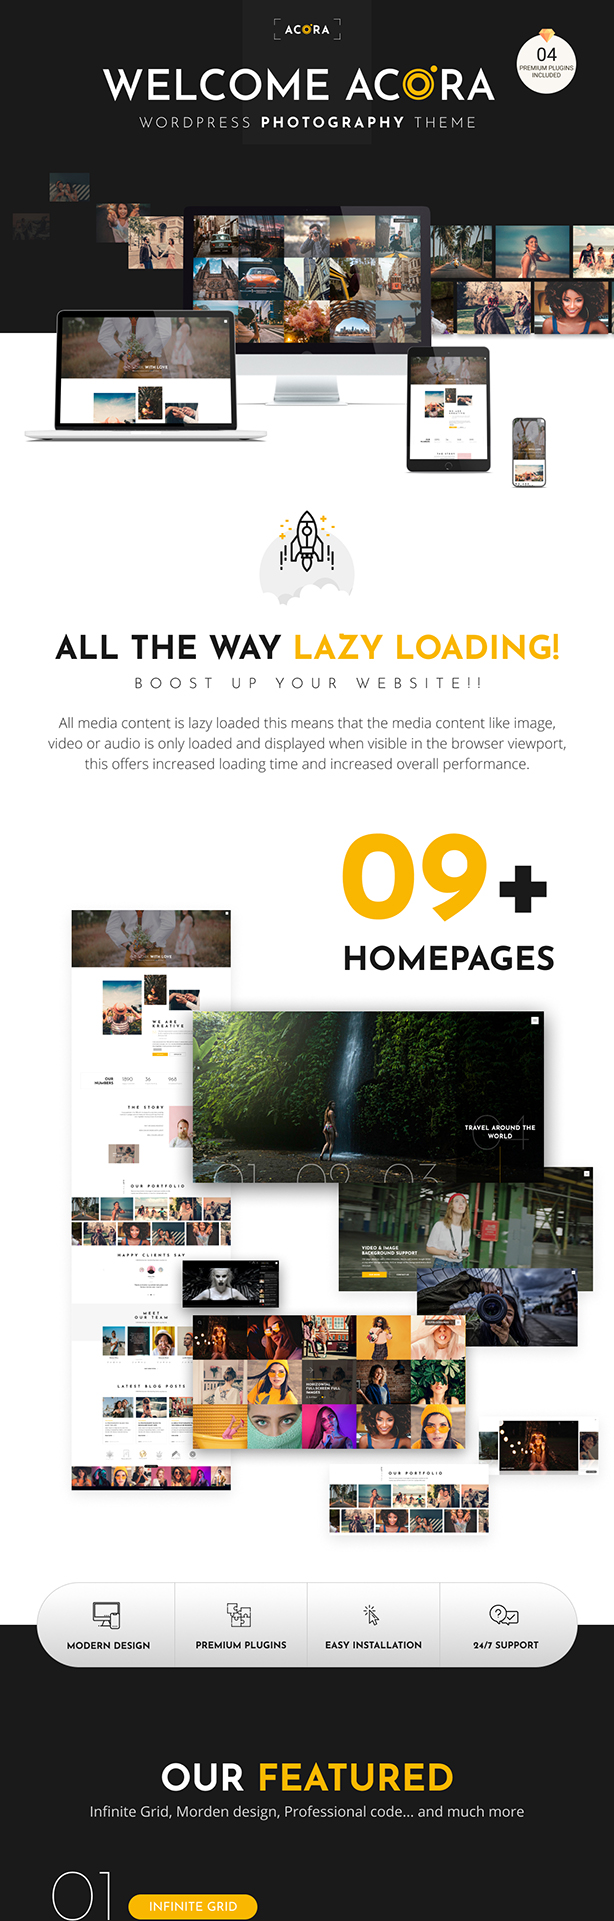 Acora - Photography WordPress Theme - 1